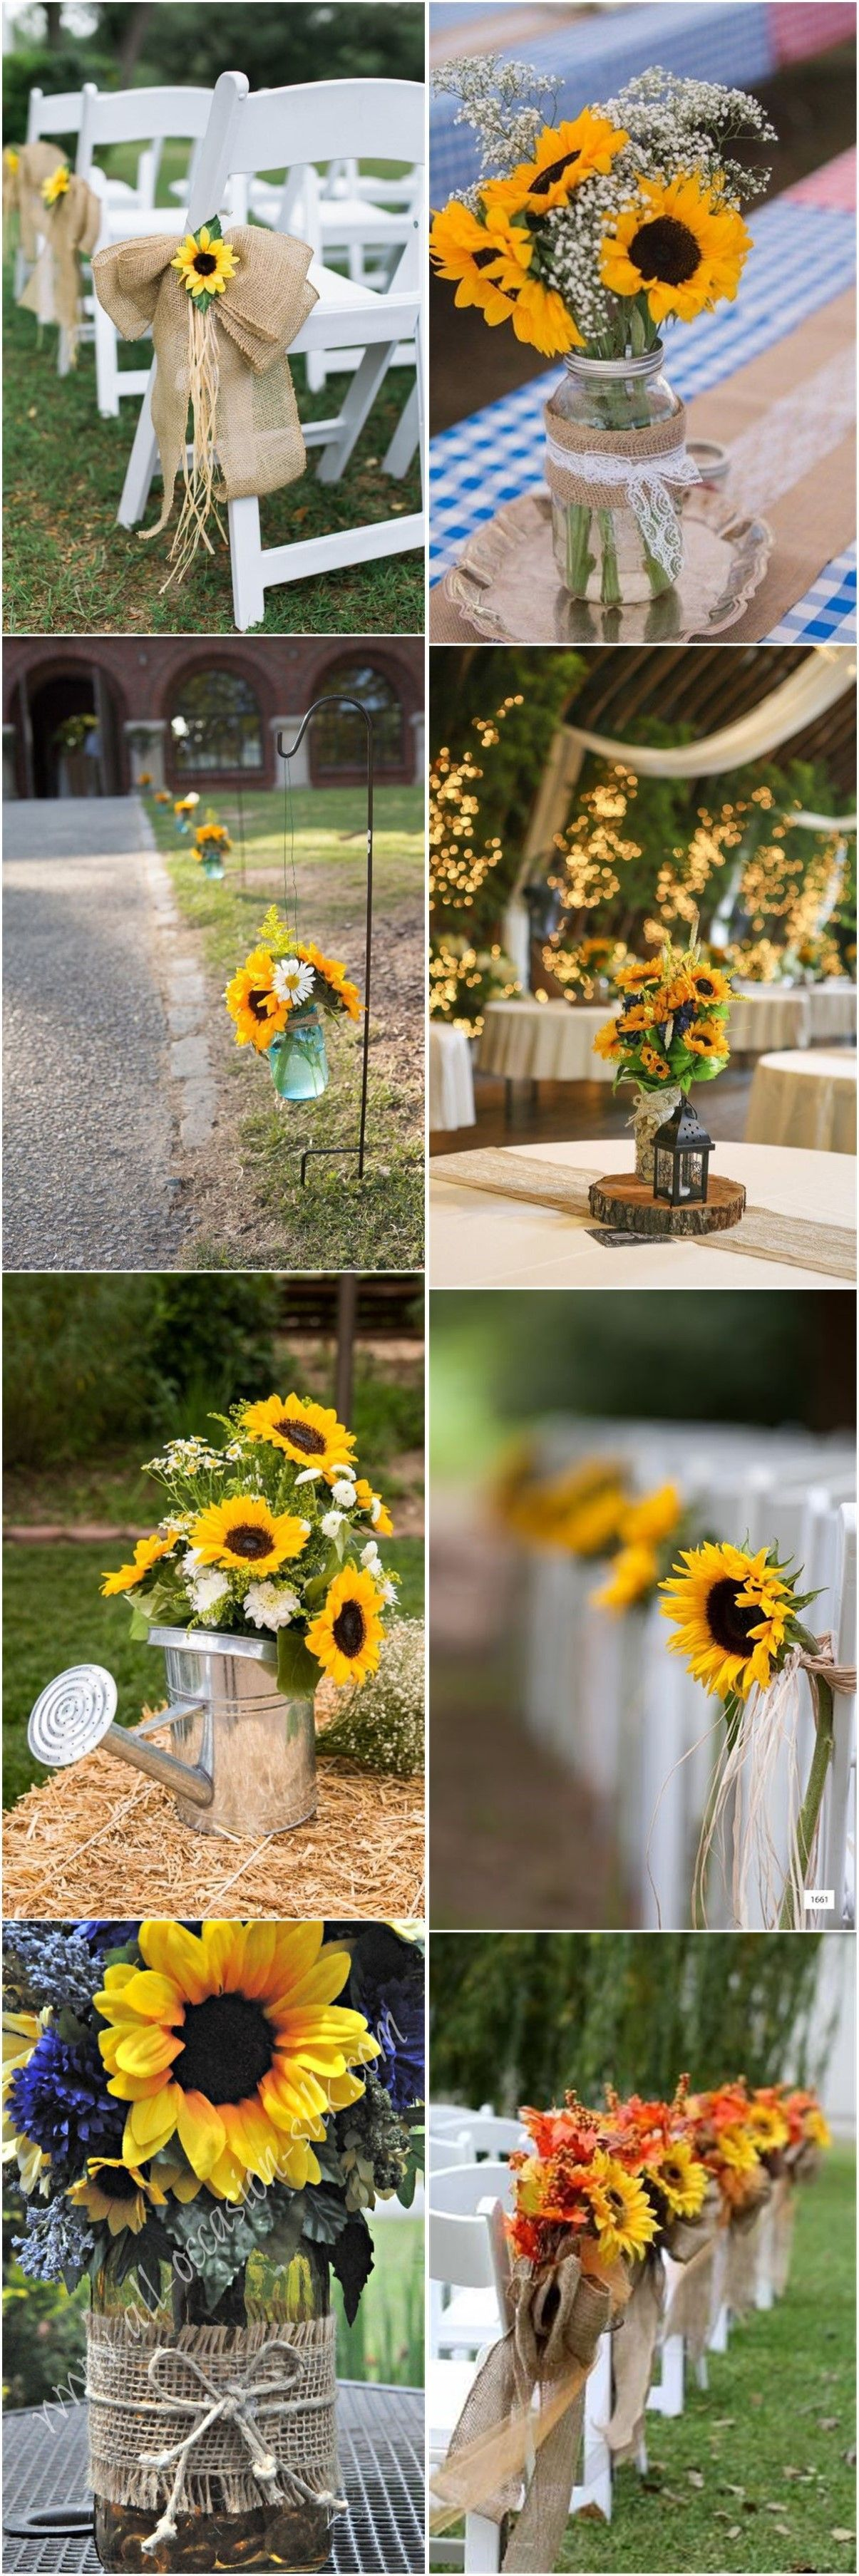 Pin by Angela on Wedding Sunflower wedding decorations